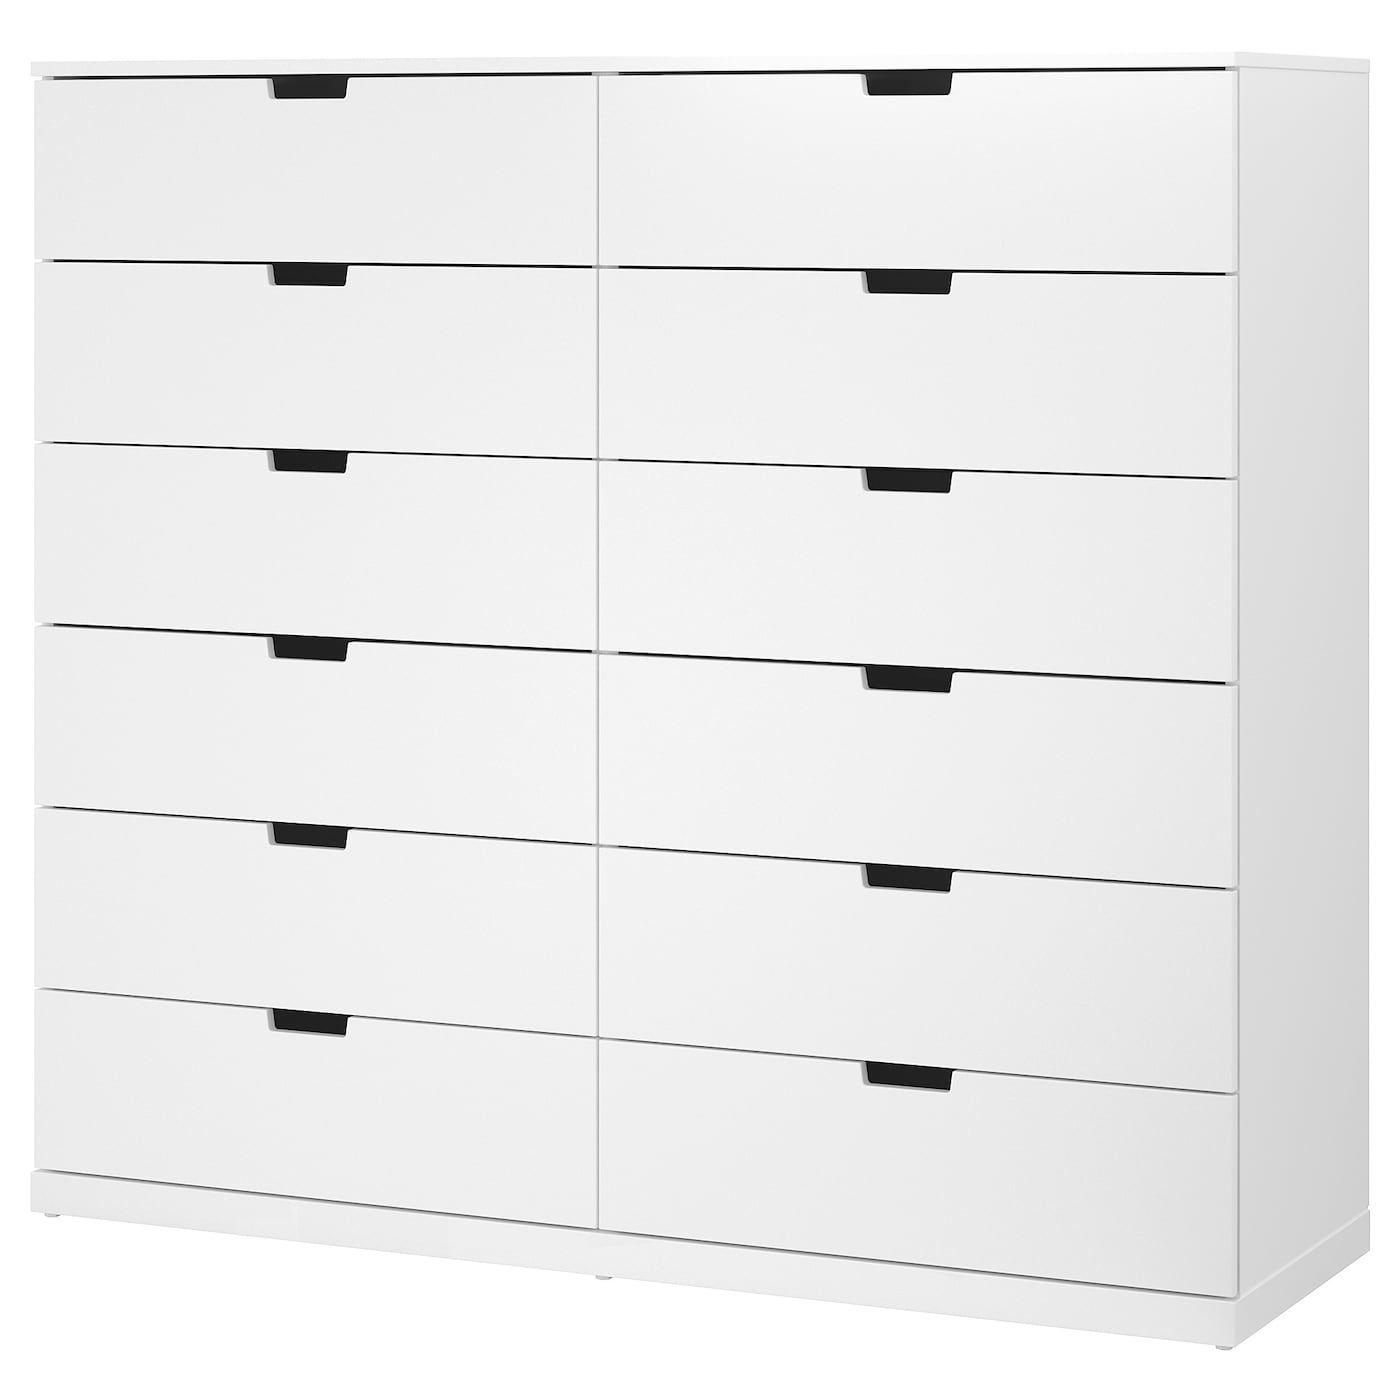 Nordli 12 Drawer Chest White 63x57 1 8 Ikea In 2021 Ikea Bedroom Storage Ikea Nordli Ikea [ 1400 x 1400 Pixel ]